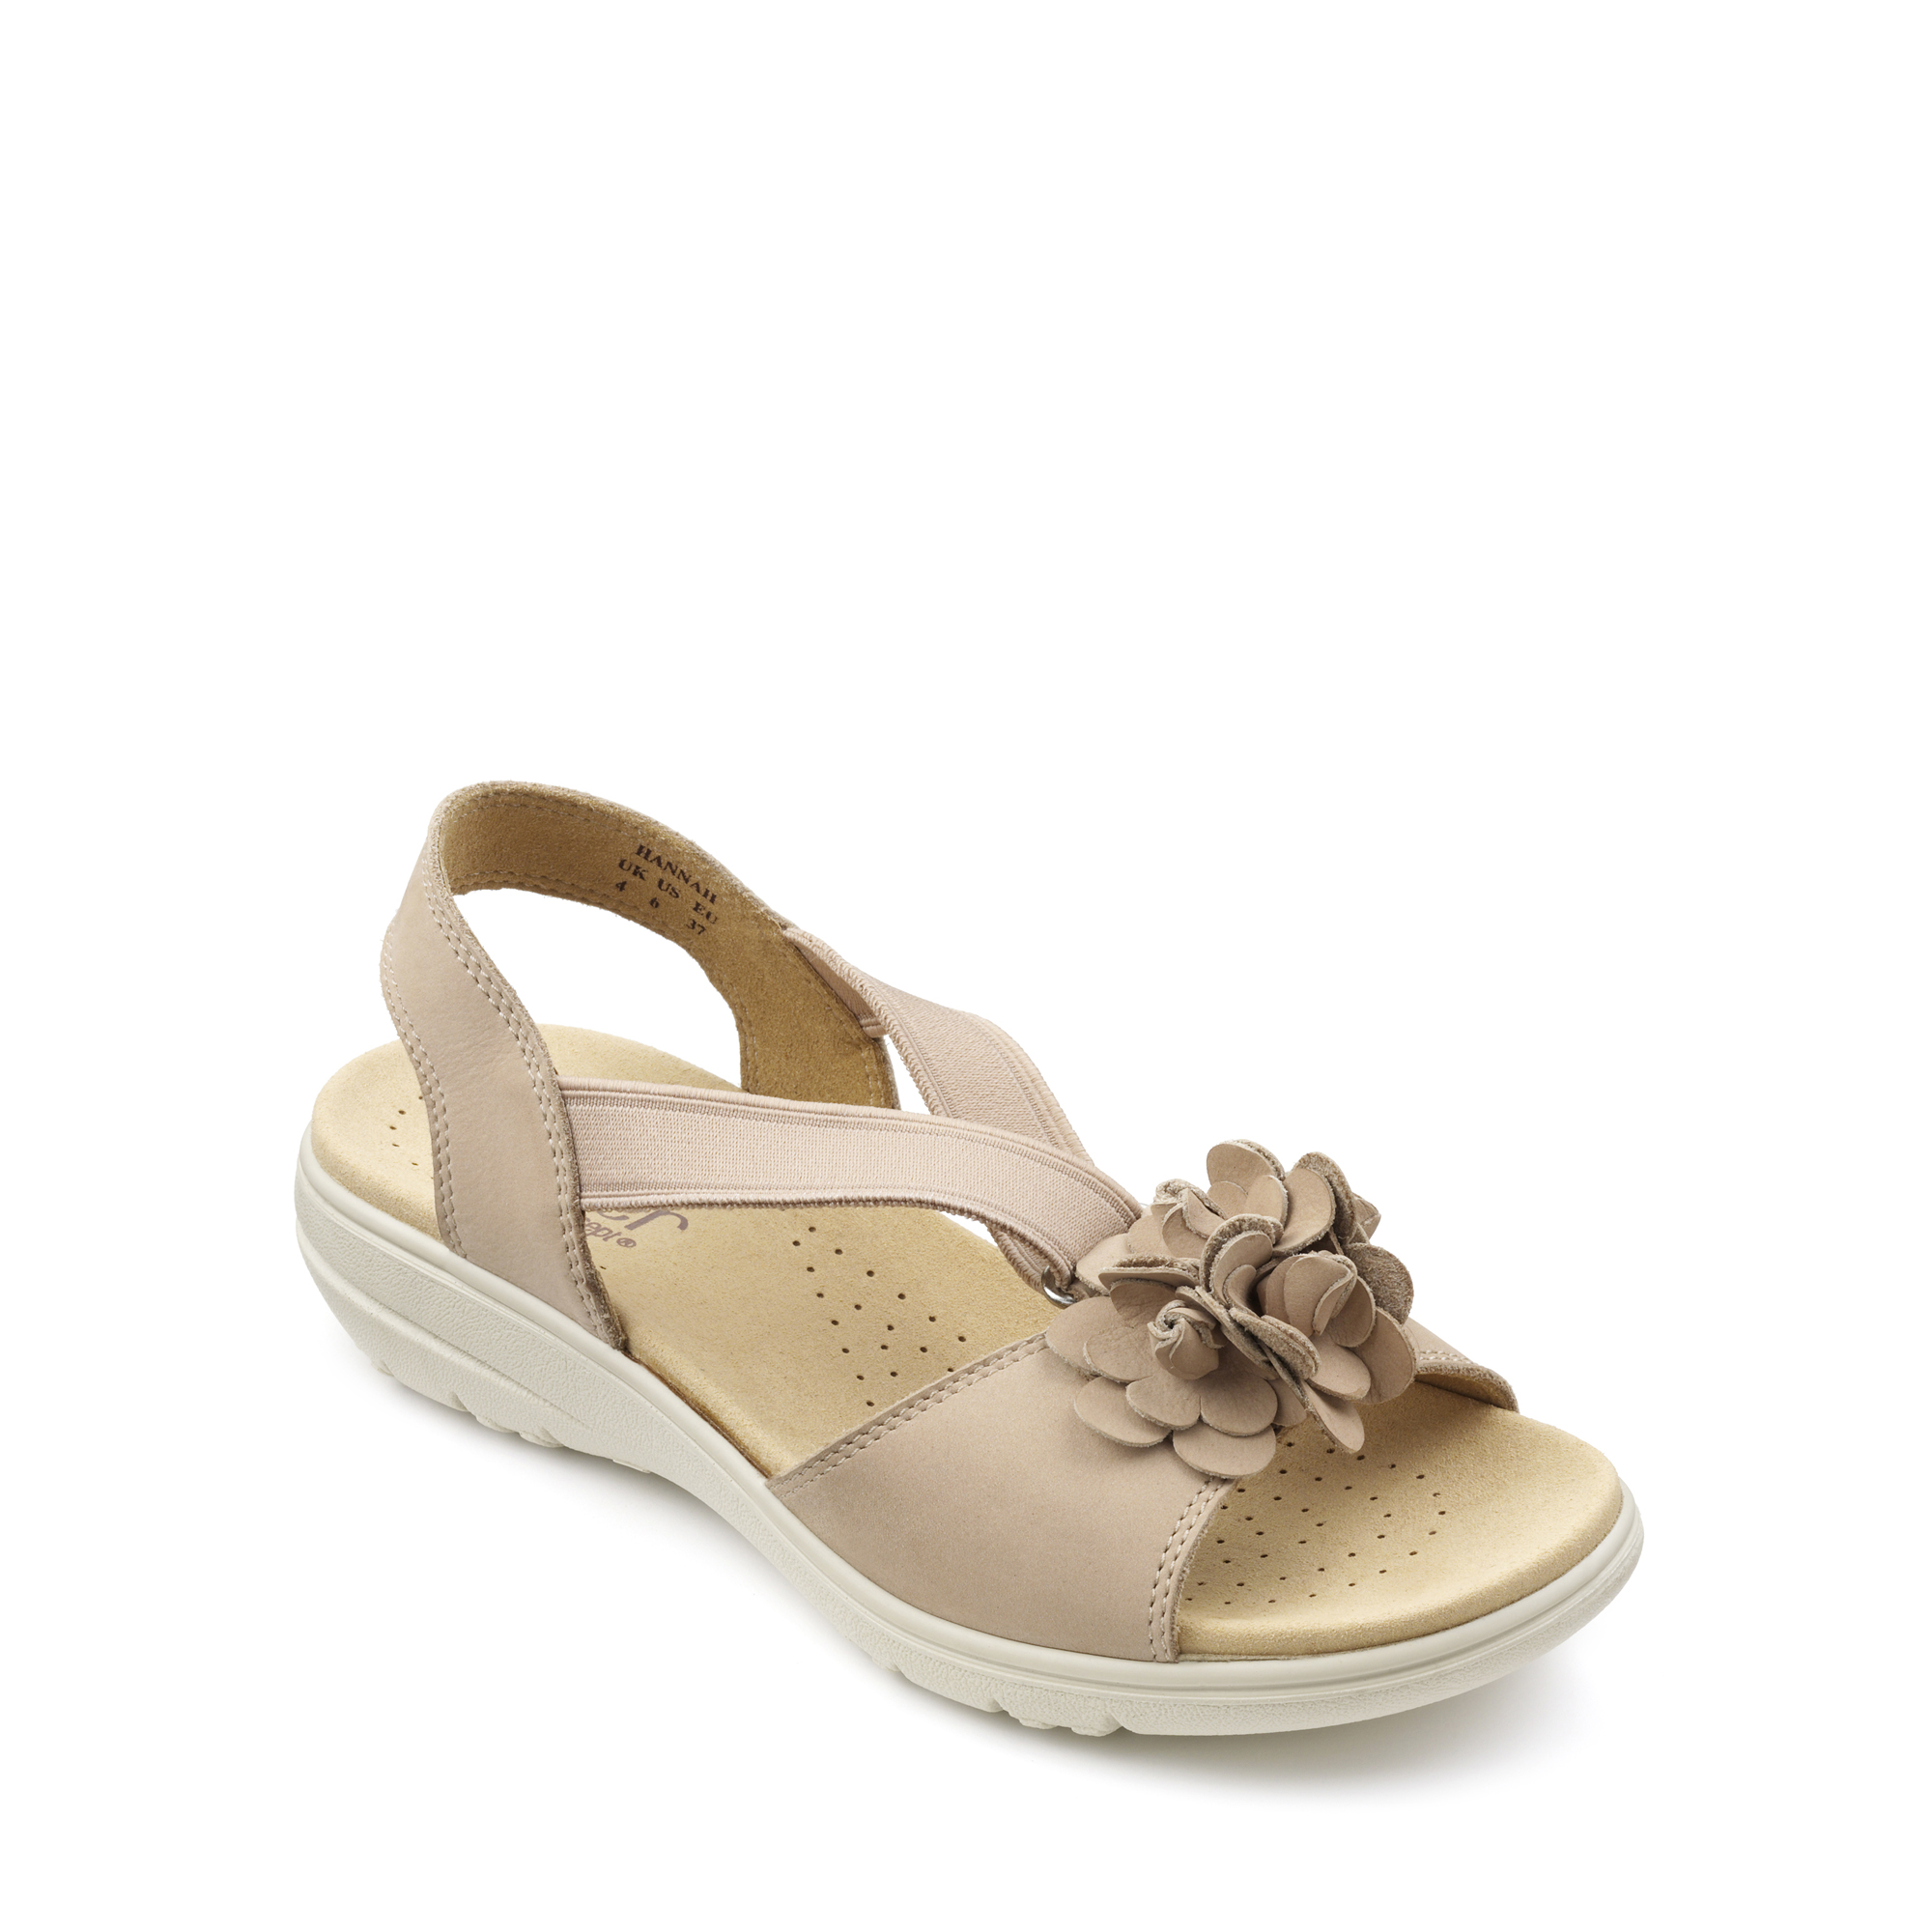 Hotter-Mujer-Hannah-Senoras-Casual-Sandalias-Verano-Calzado-Textil